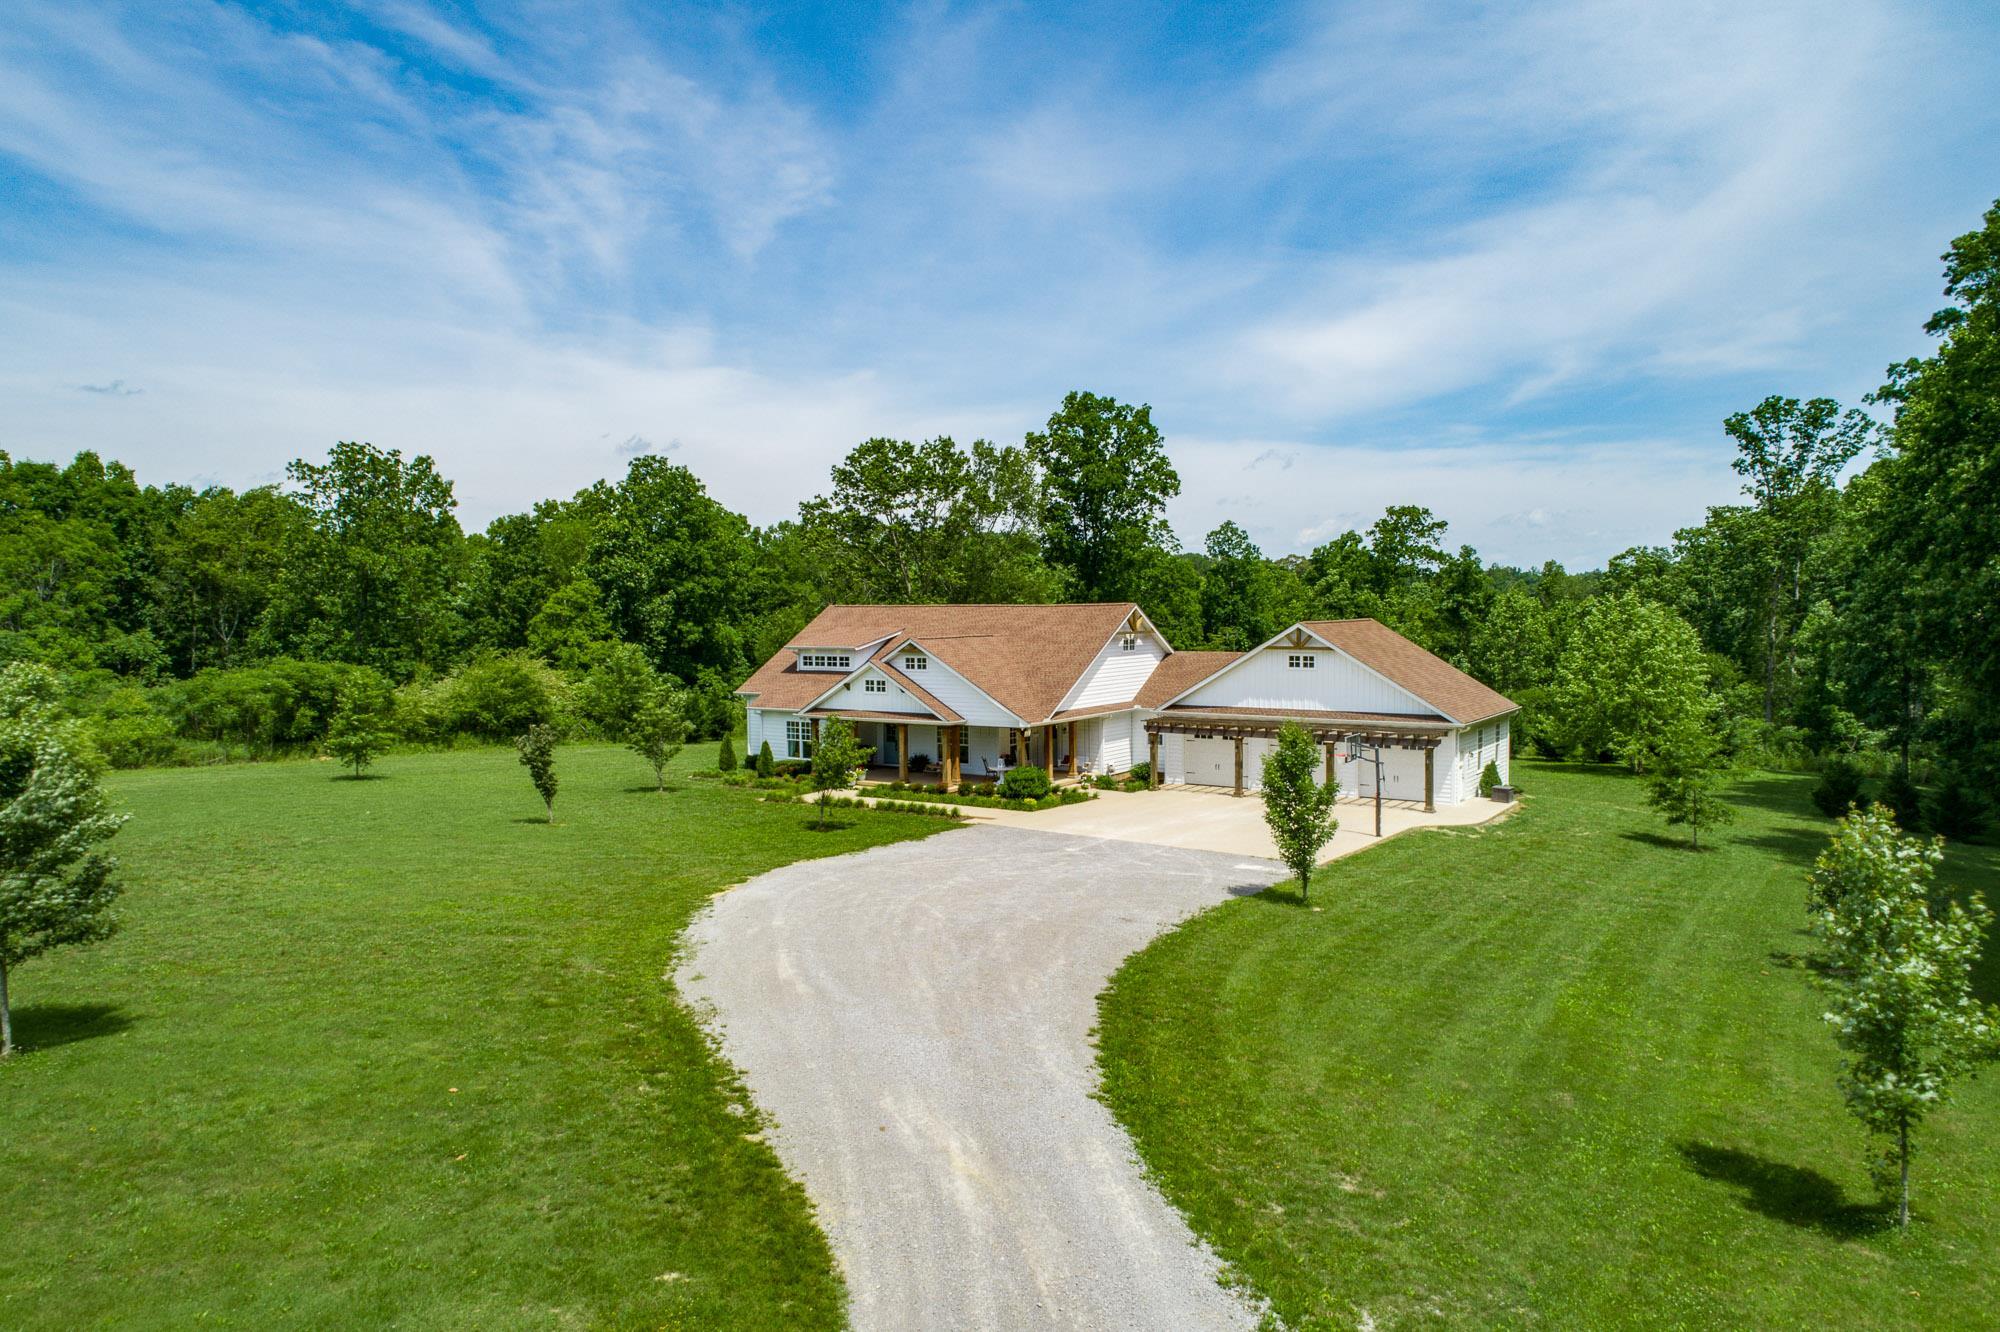 405 Creekside Dr, Smithville, TN 37166 - Smithville, TN real estate listing